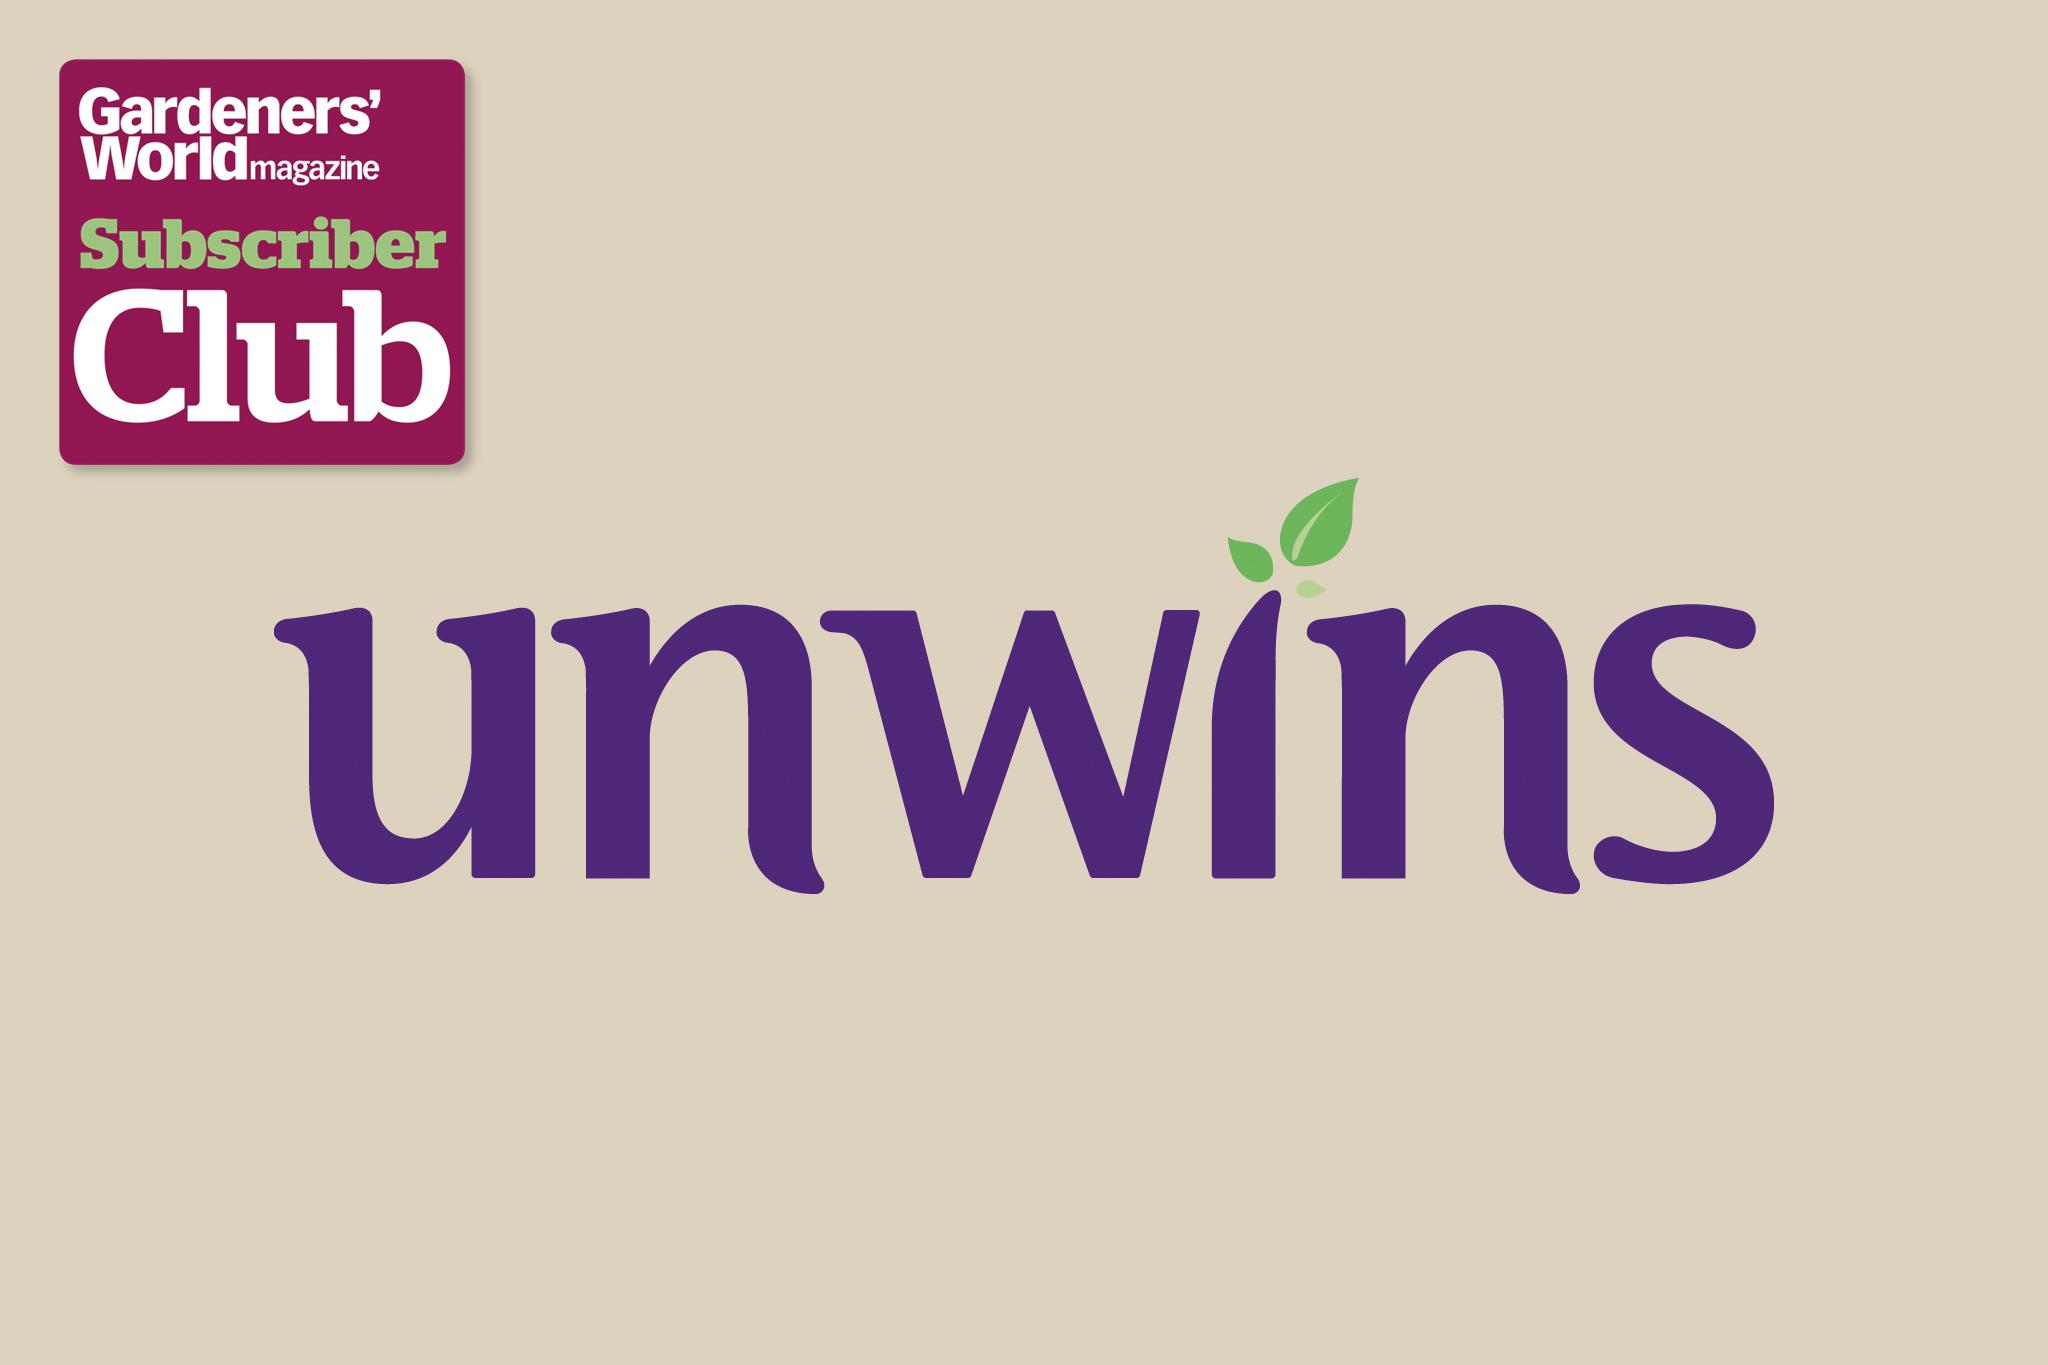 Unwins BBC Gardeners' World Magazine Subscriber Club discount